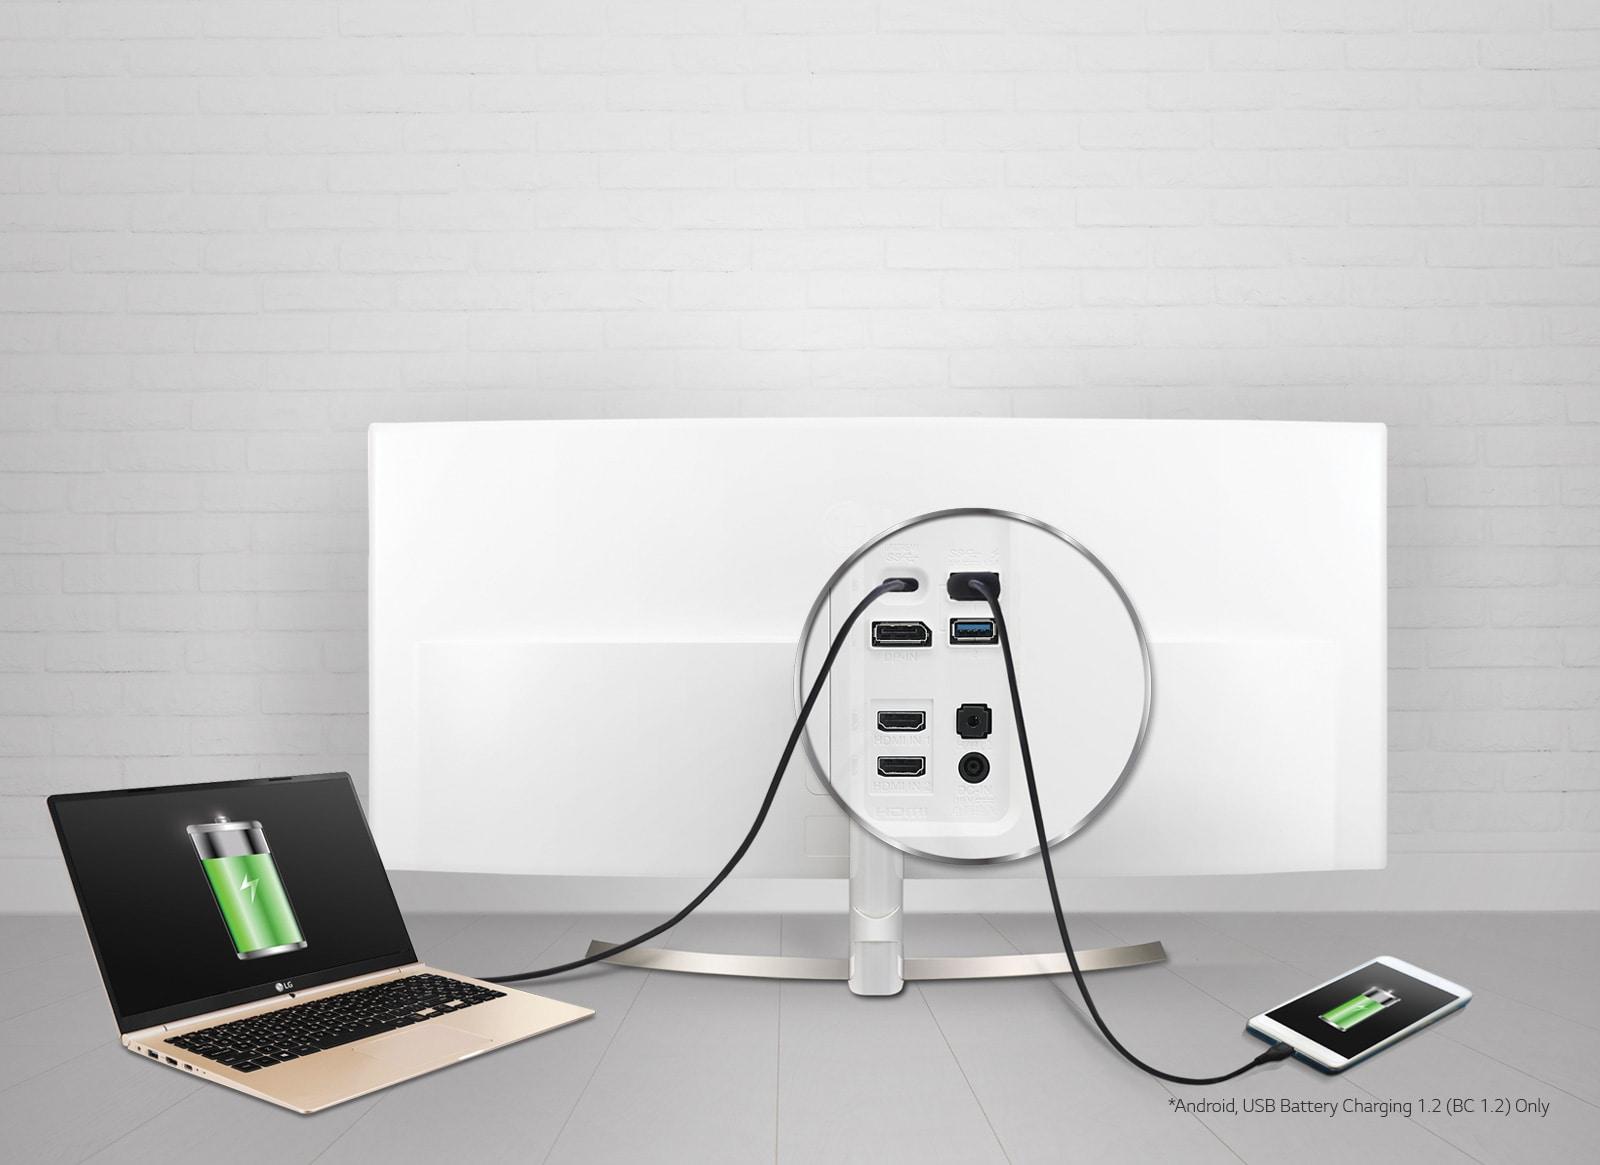 USB Type-C™ & USB 3.0 Quick Charge